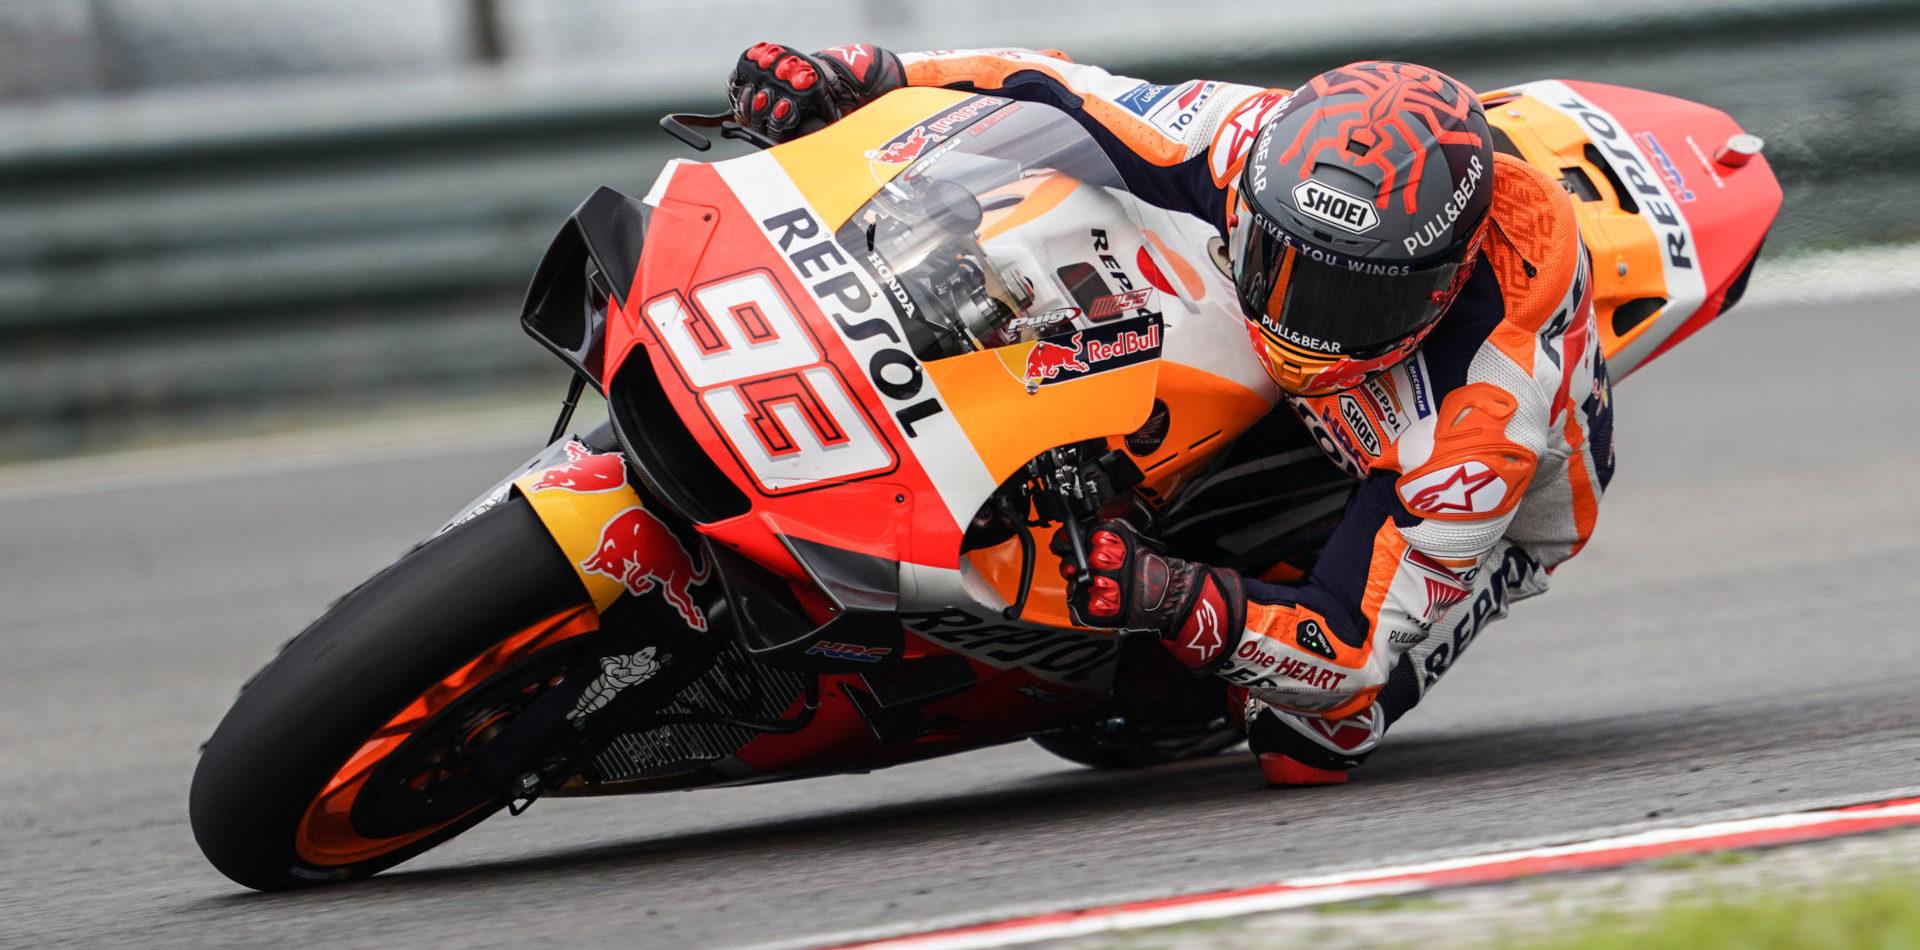 Motogp Marc Marquez Extends Contract With Honda Through 2024 Roadracing World Magazine Motorcycle Riding Racing Tech News